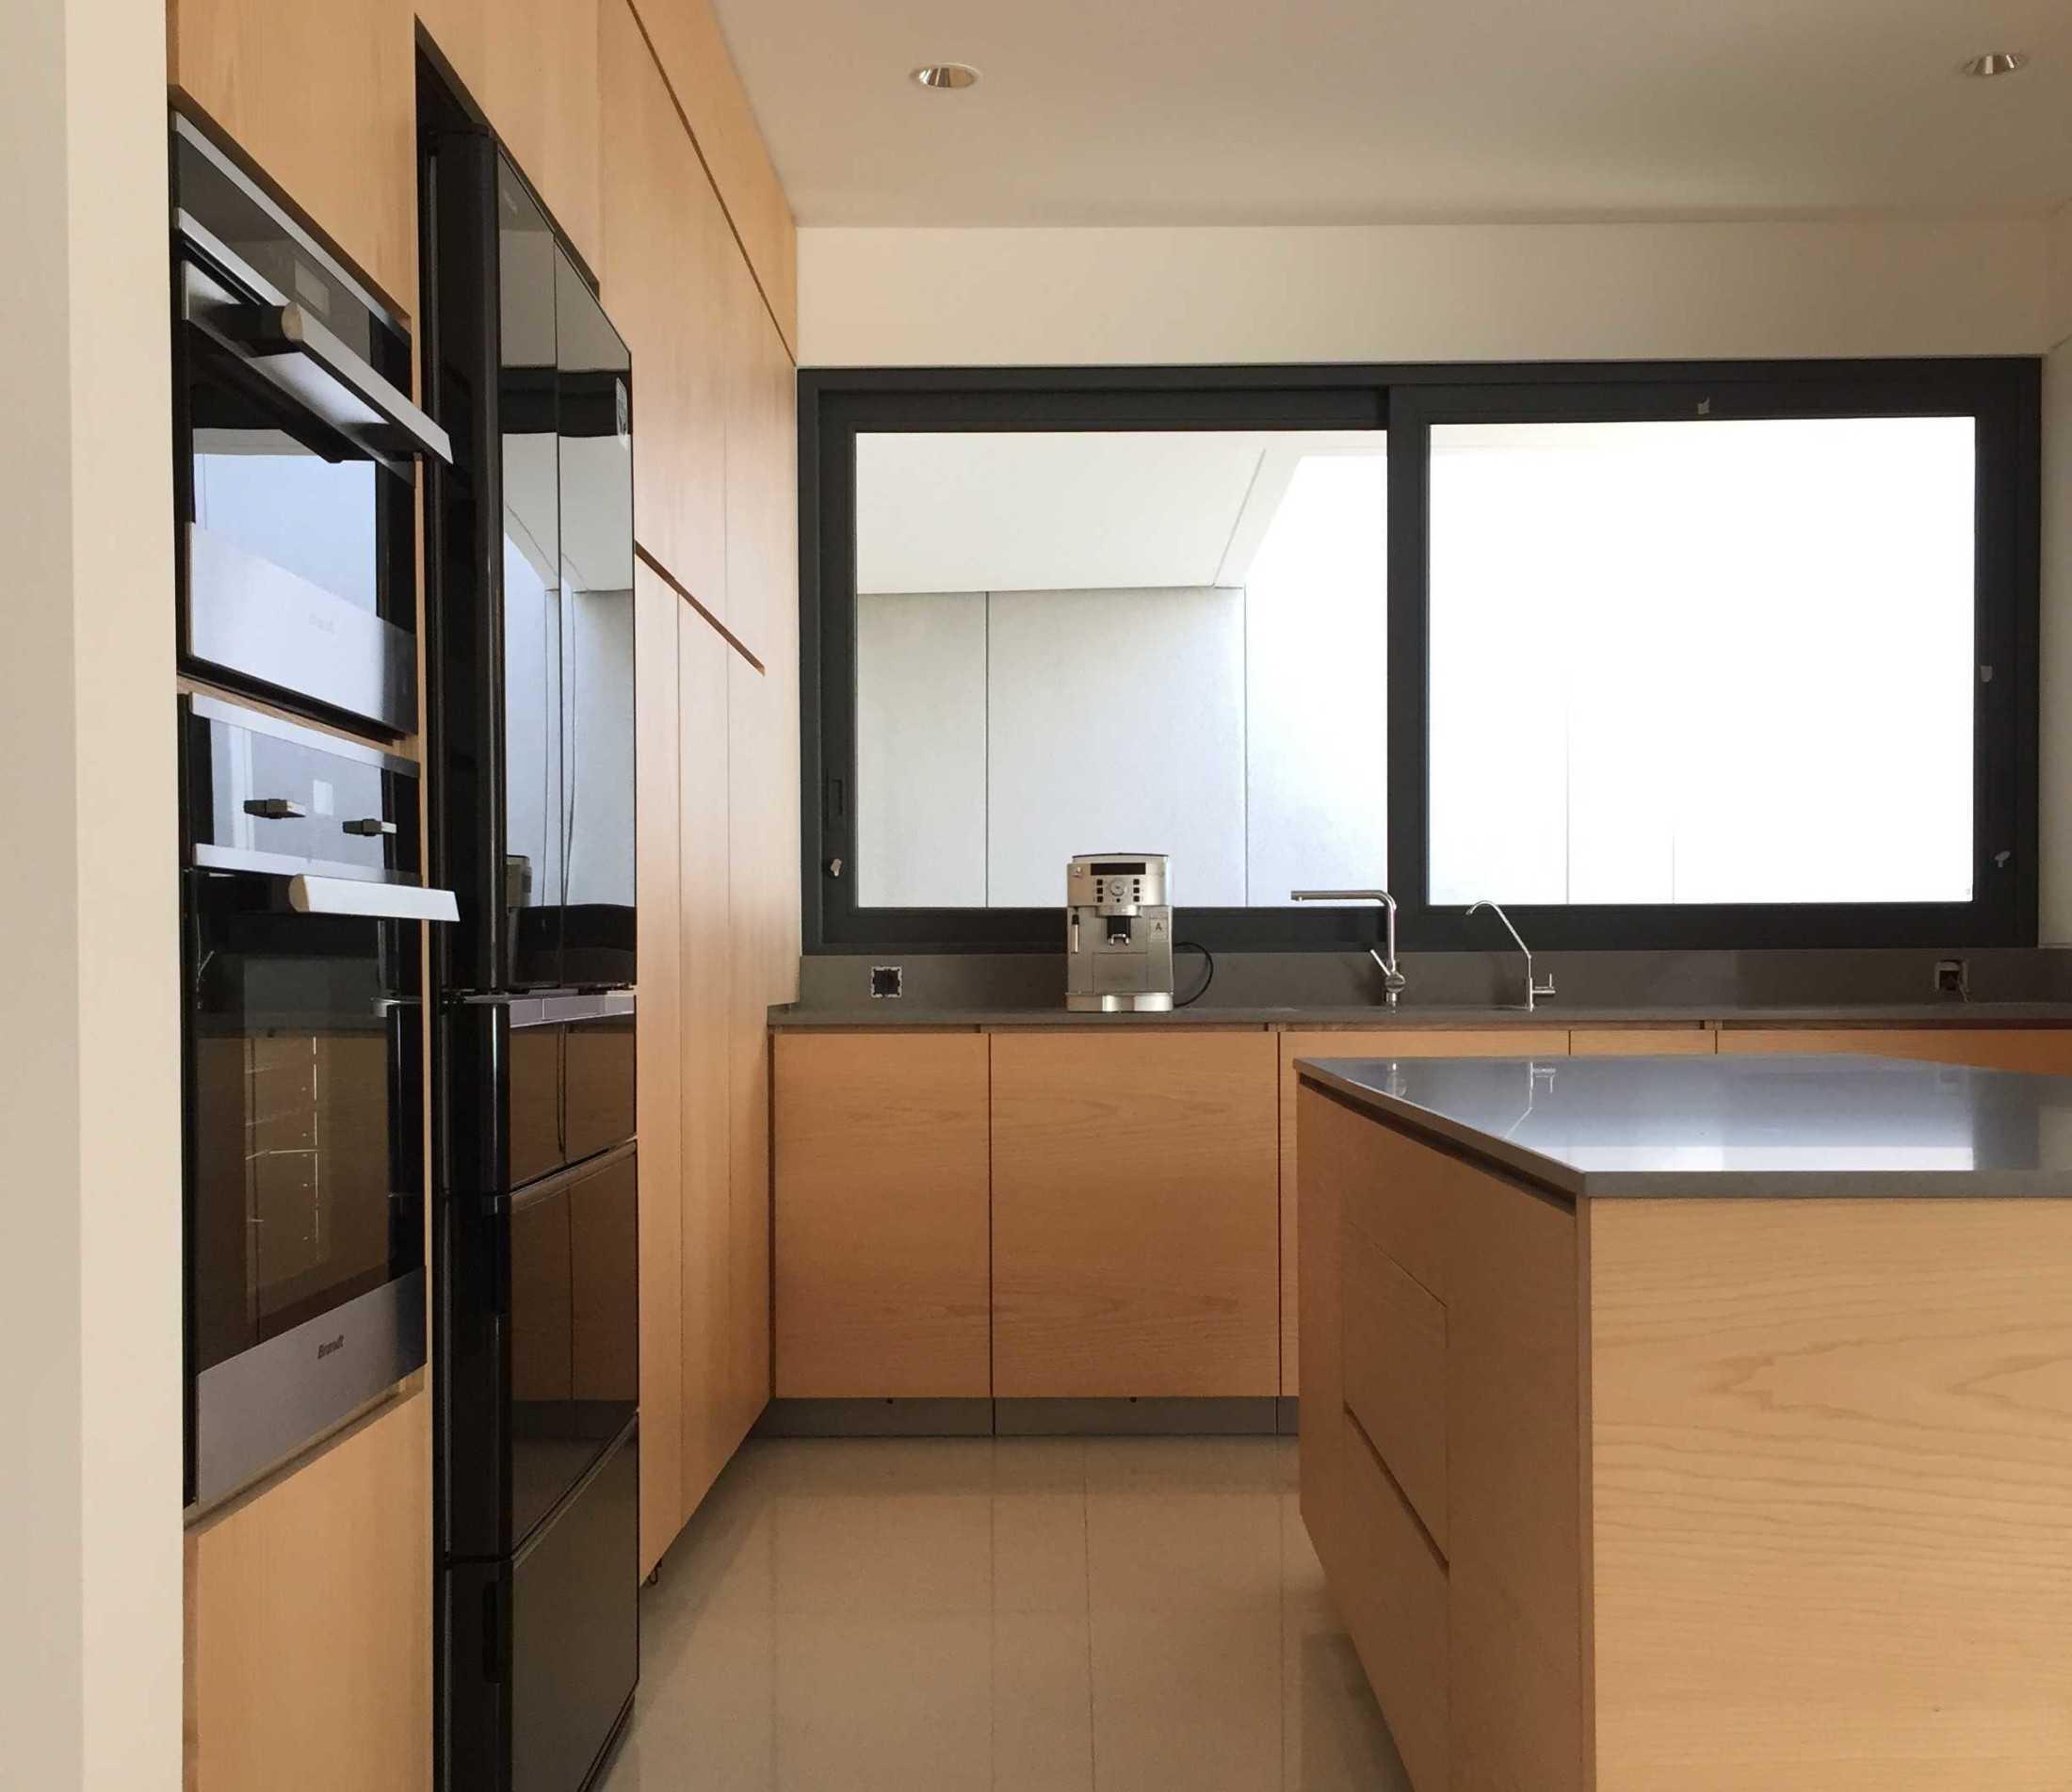 Sebuah desain minimalis dapat diakui berhasil menunjukkan jati diri gayanya jika berhasil memanfaatkan setiap elemen dalam ruang berfungsi dengan optimal. Dapur minimalis dengan clean lookmenciptakan kesan bersih dan elegan. Garis-garis vertikal yang terbentuk dengan sendirinya sebagai pembatas antar kabinet, menjadi penegas gaya minimalis.